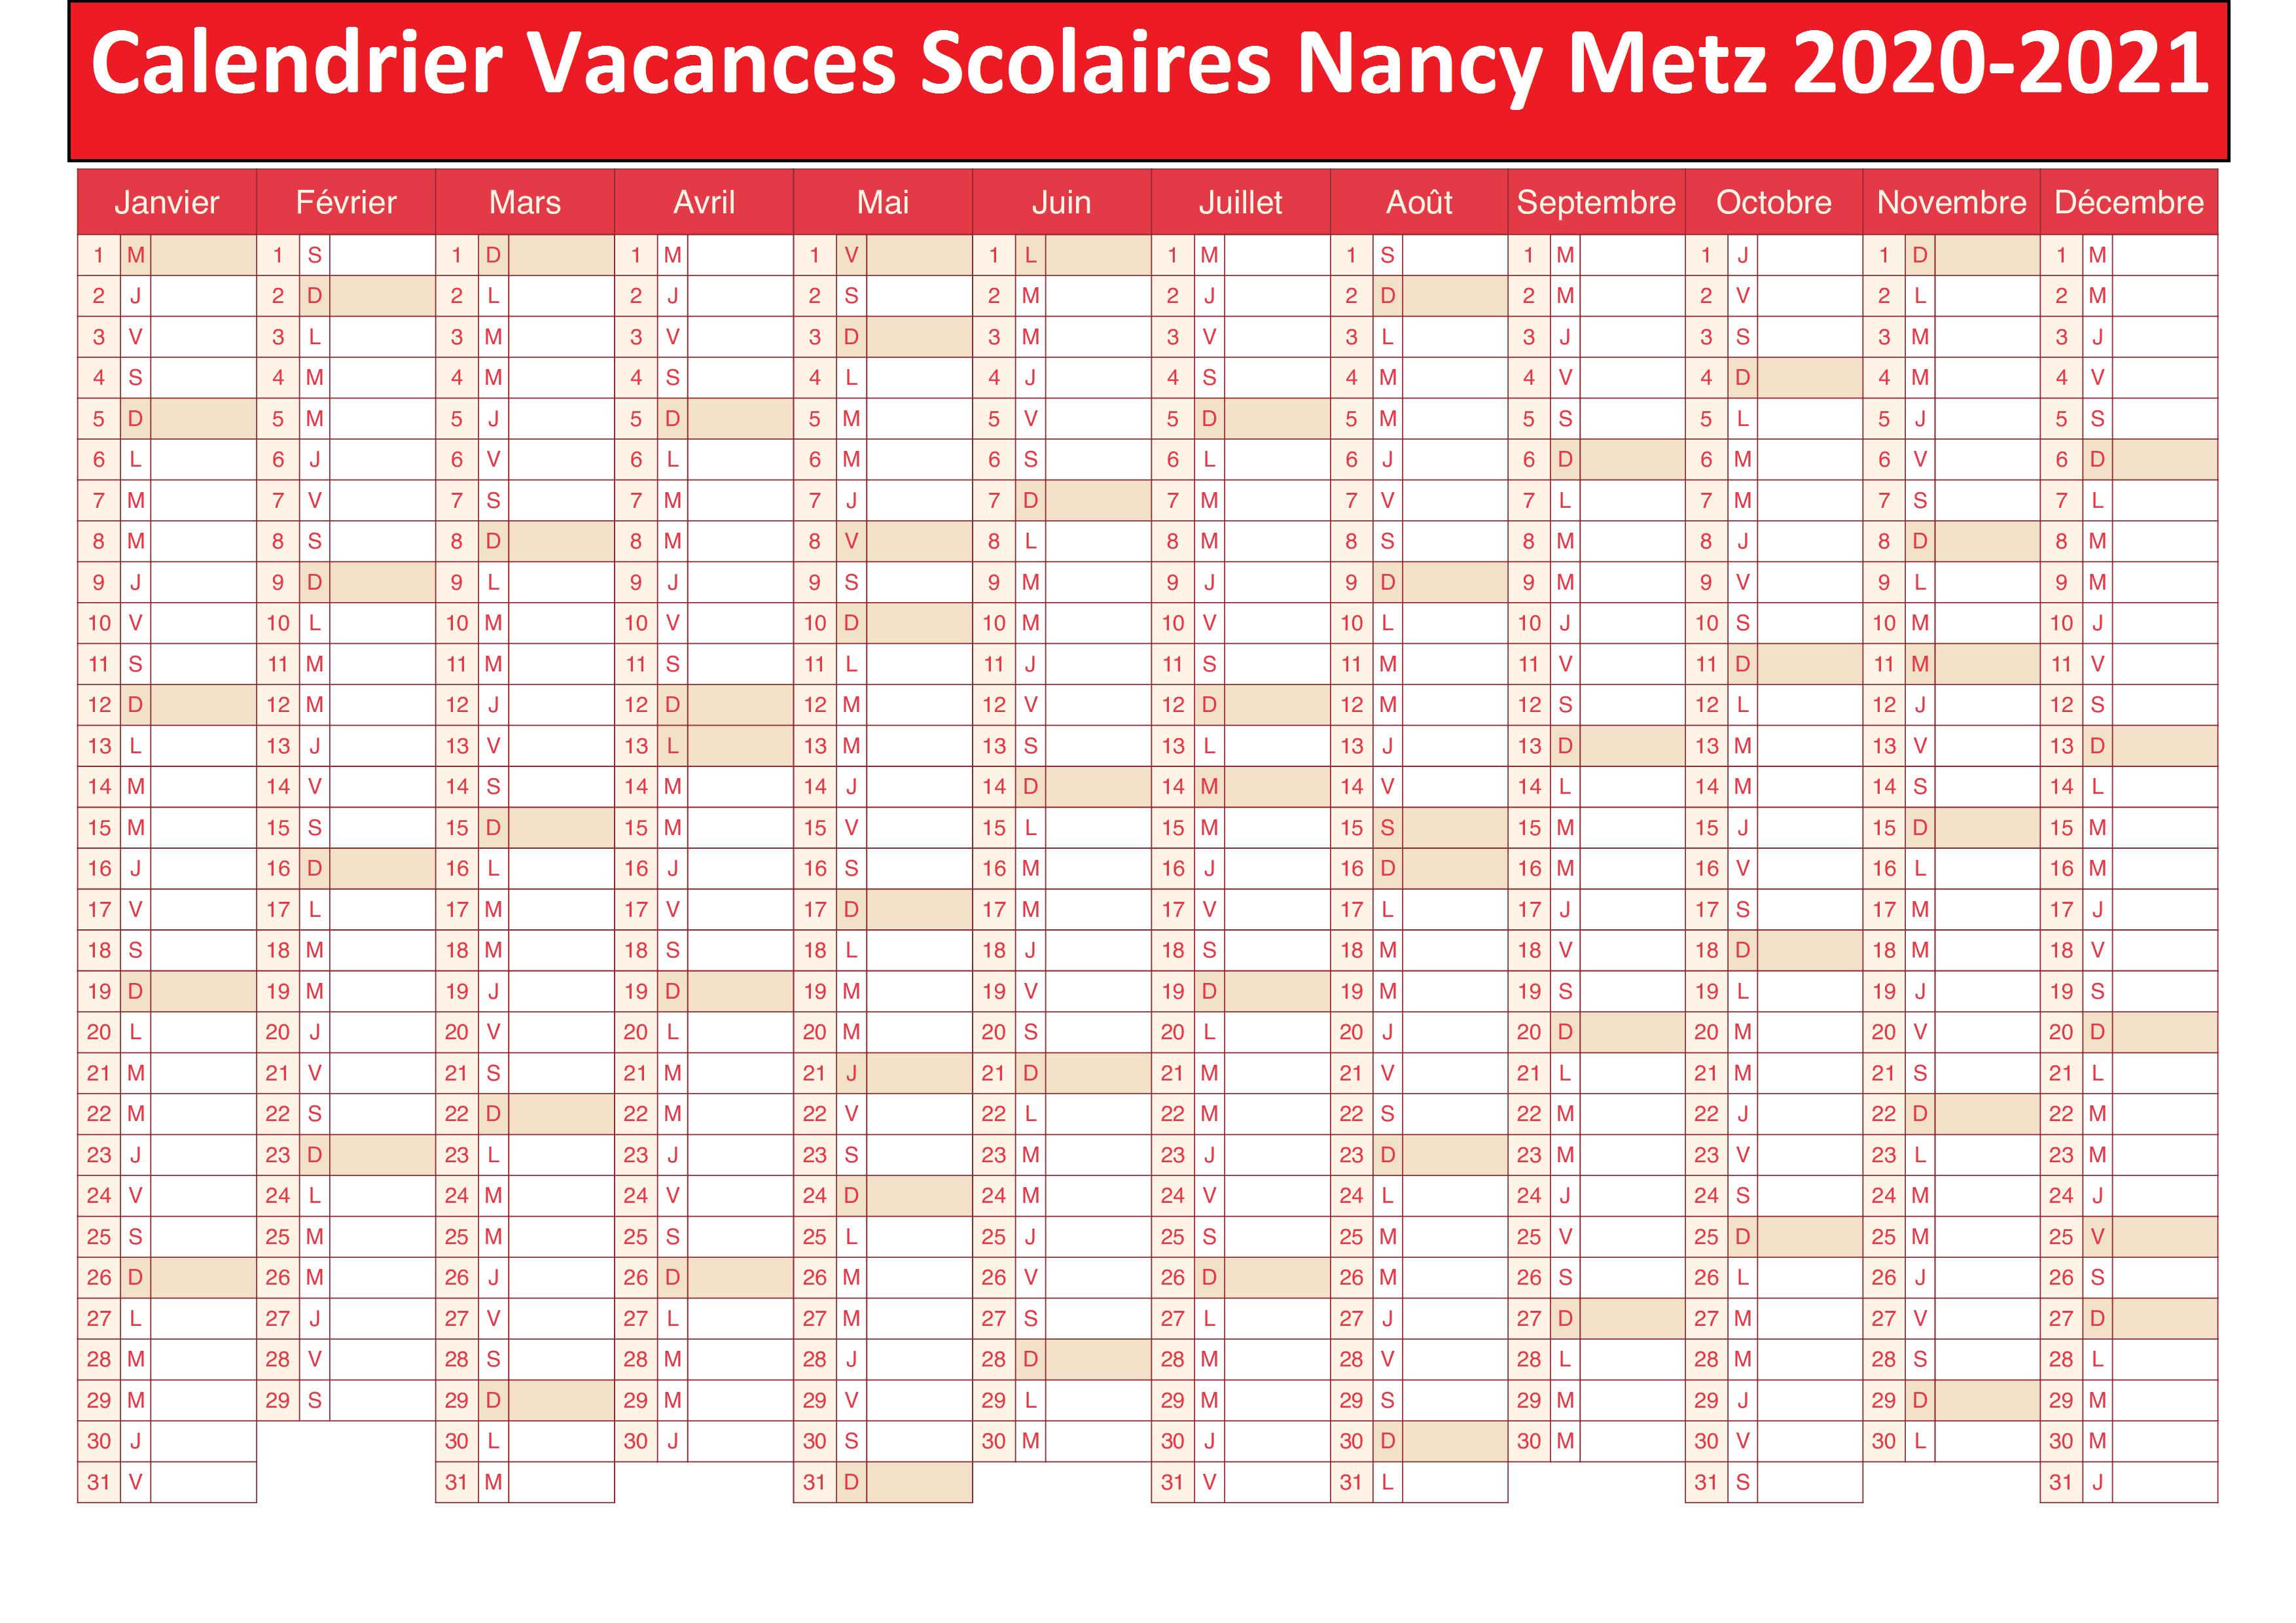 Calendrier Vacances Scolaires 2020 Academie De Nancy Metz